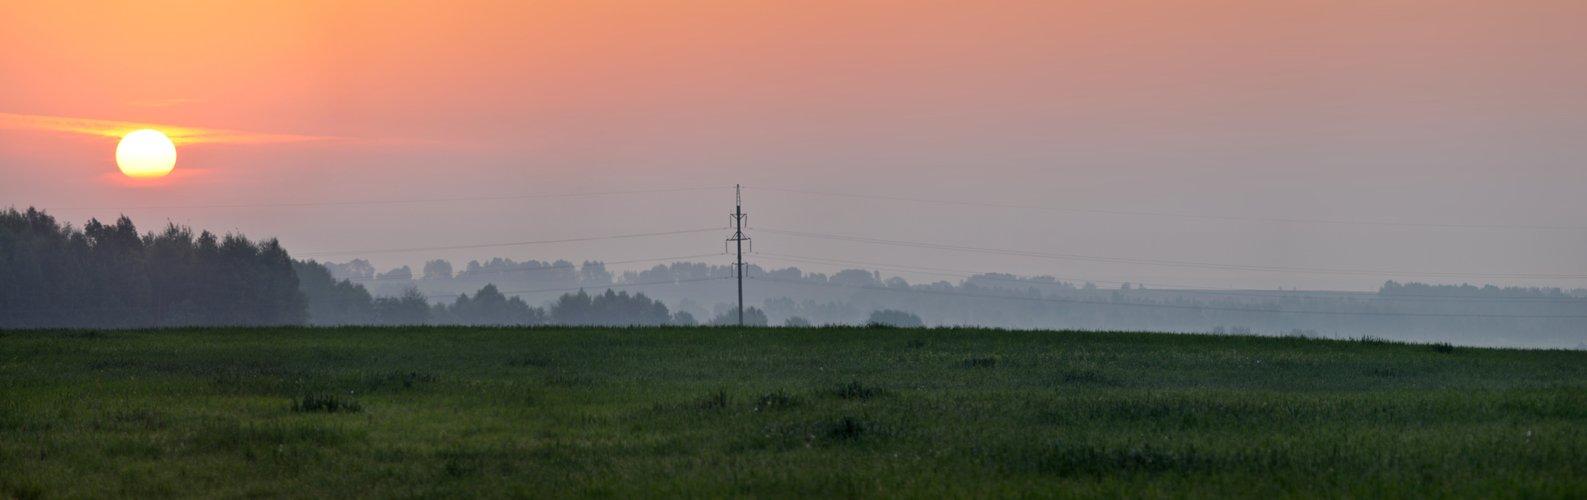 восход, рассвет, солнце, поле, утро, пейзаж, панорама, Динара